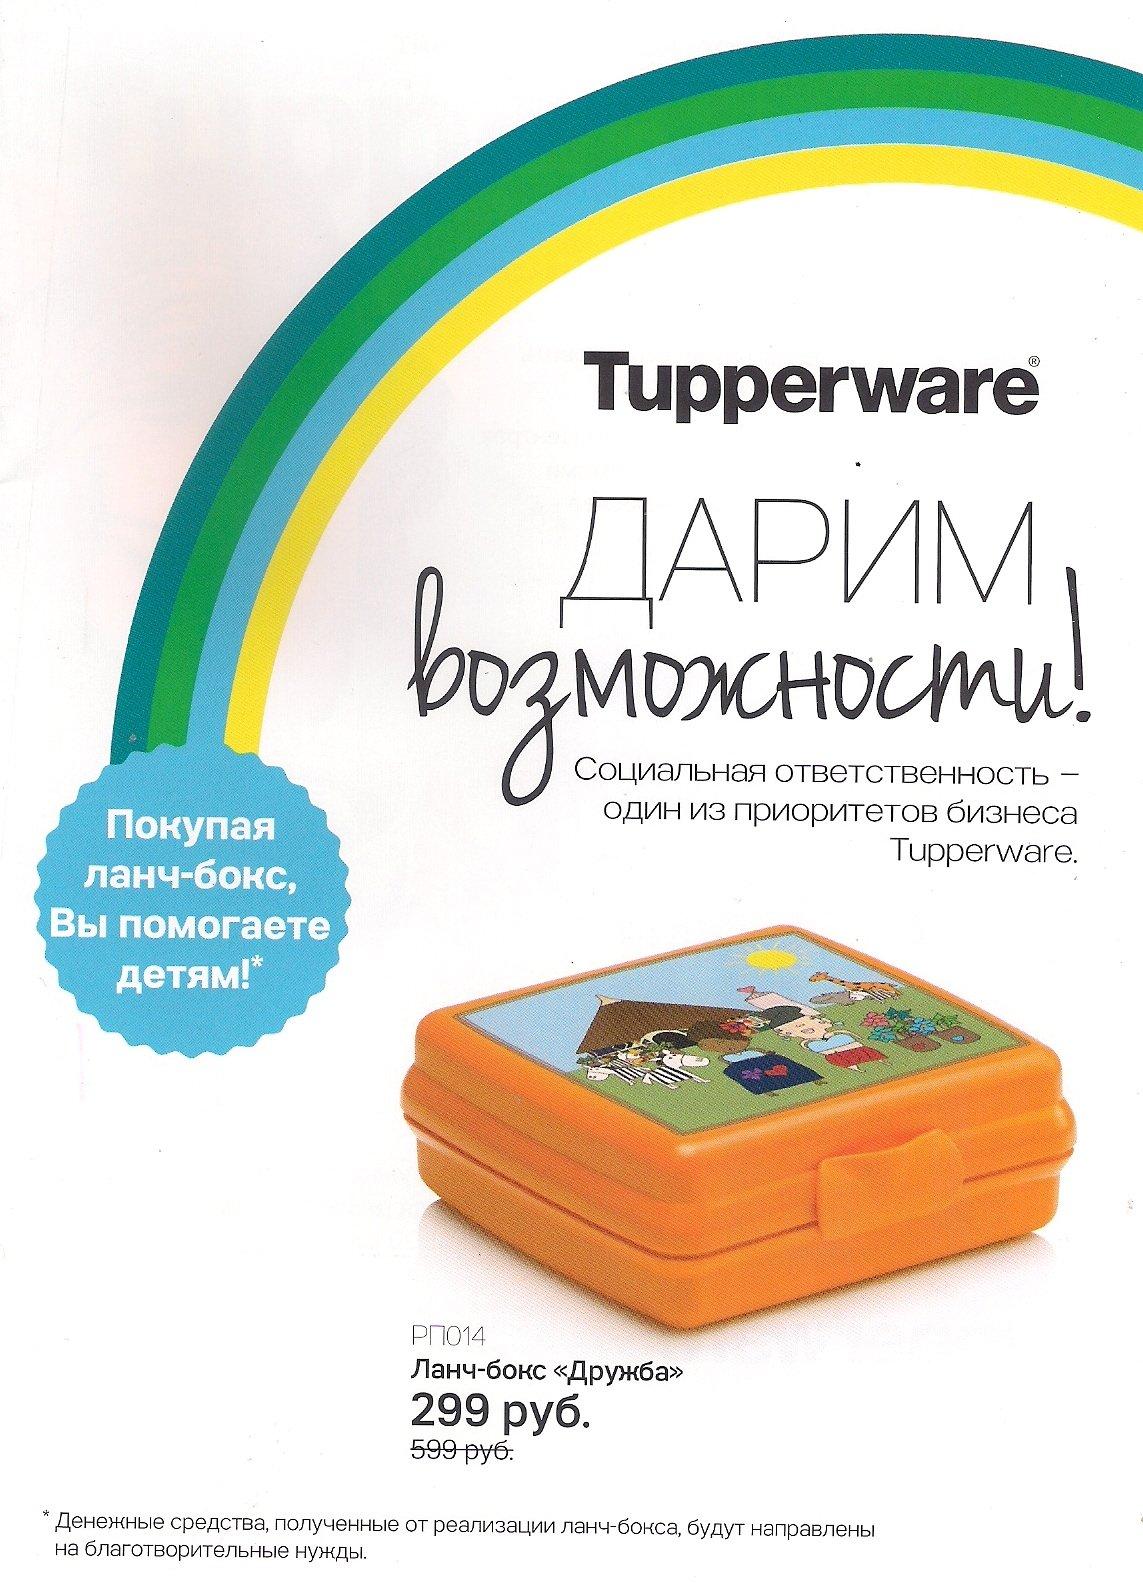 http://tupperware-online.ru/images/upload/22g.jpg